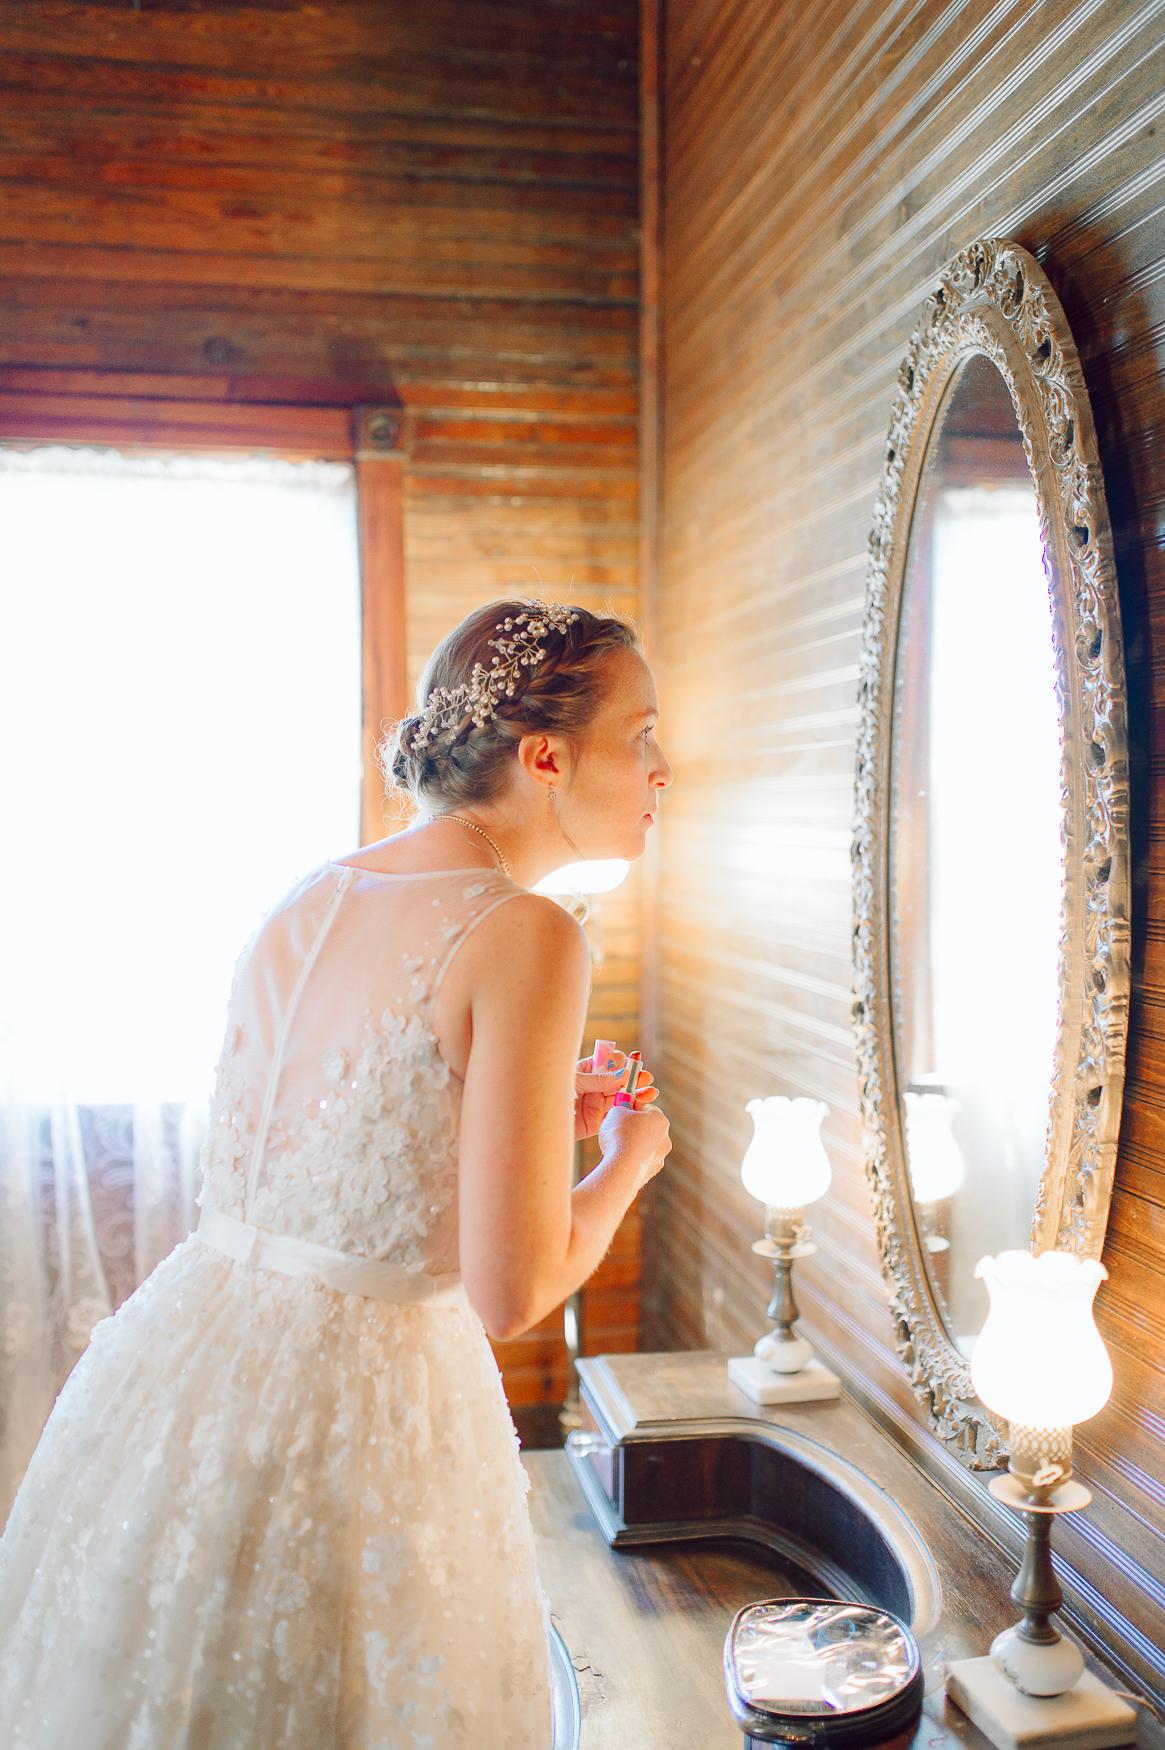 virginiawedding_theGlasgowFarm_rusticwedding_fredericksburg_youseephotography_CarolineDale (13).jpg